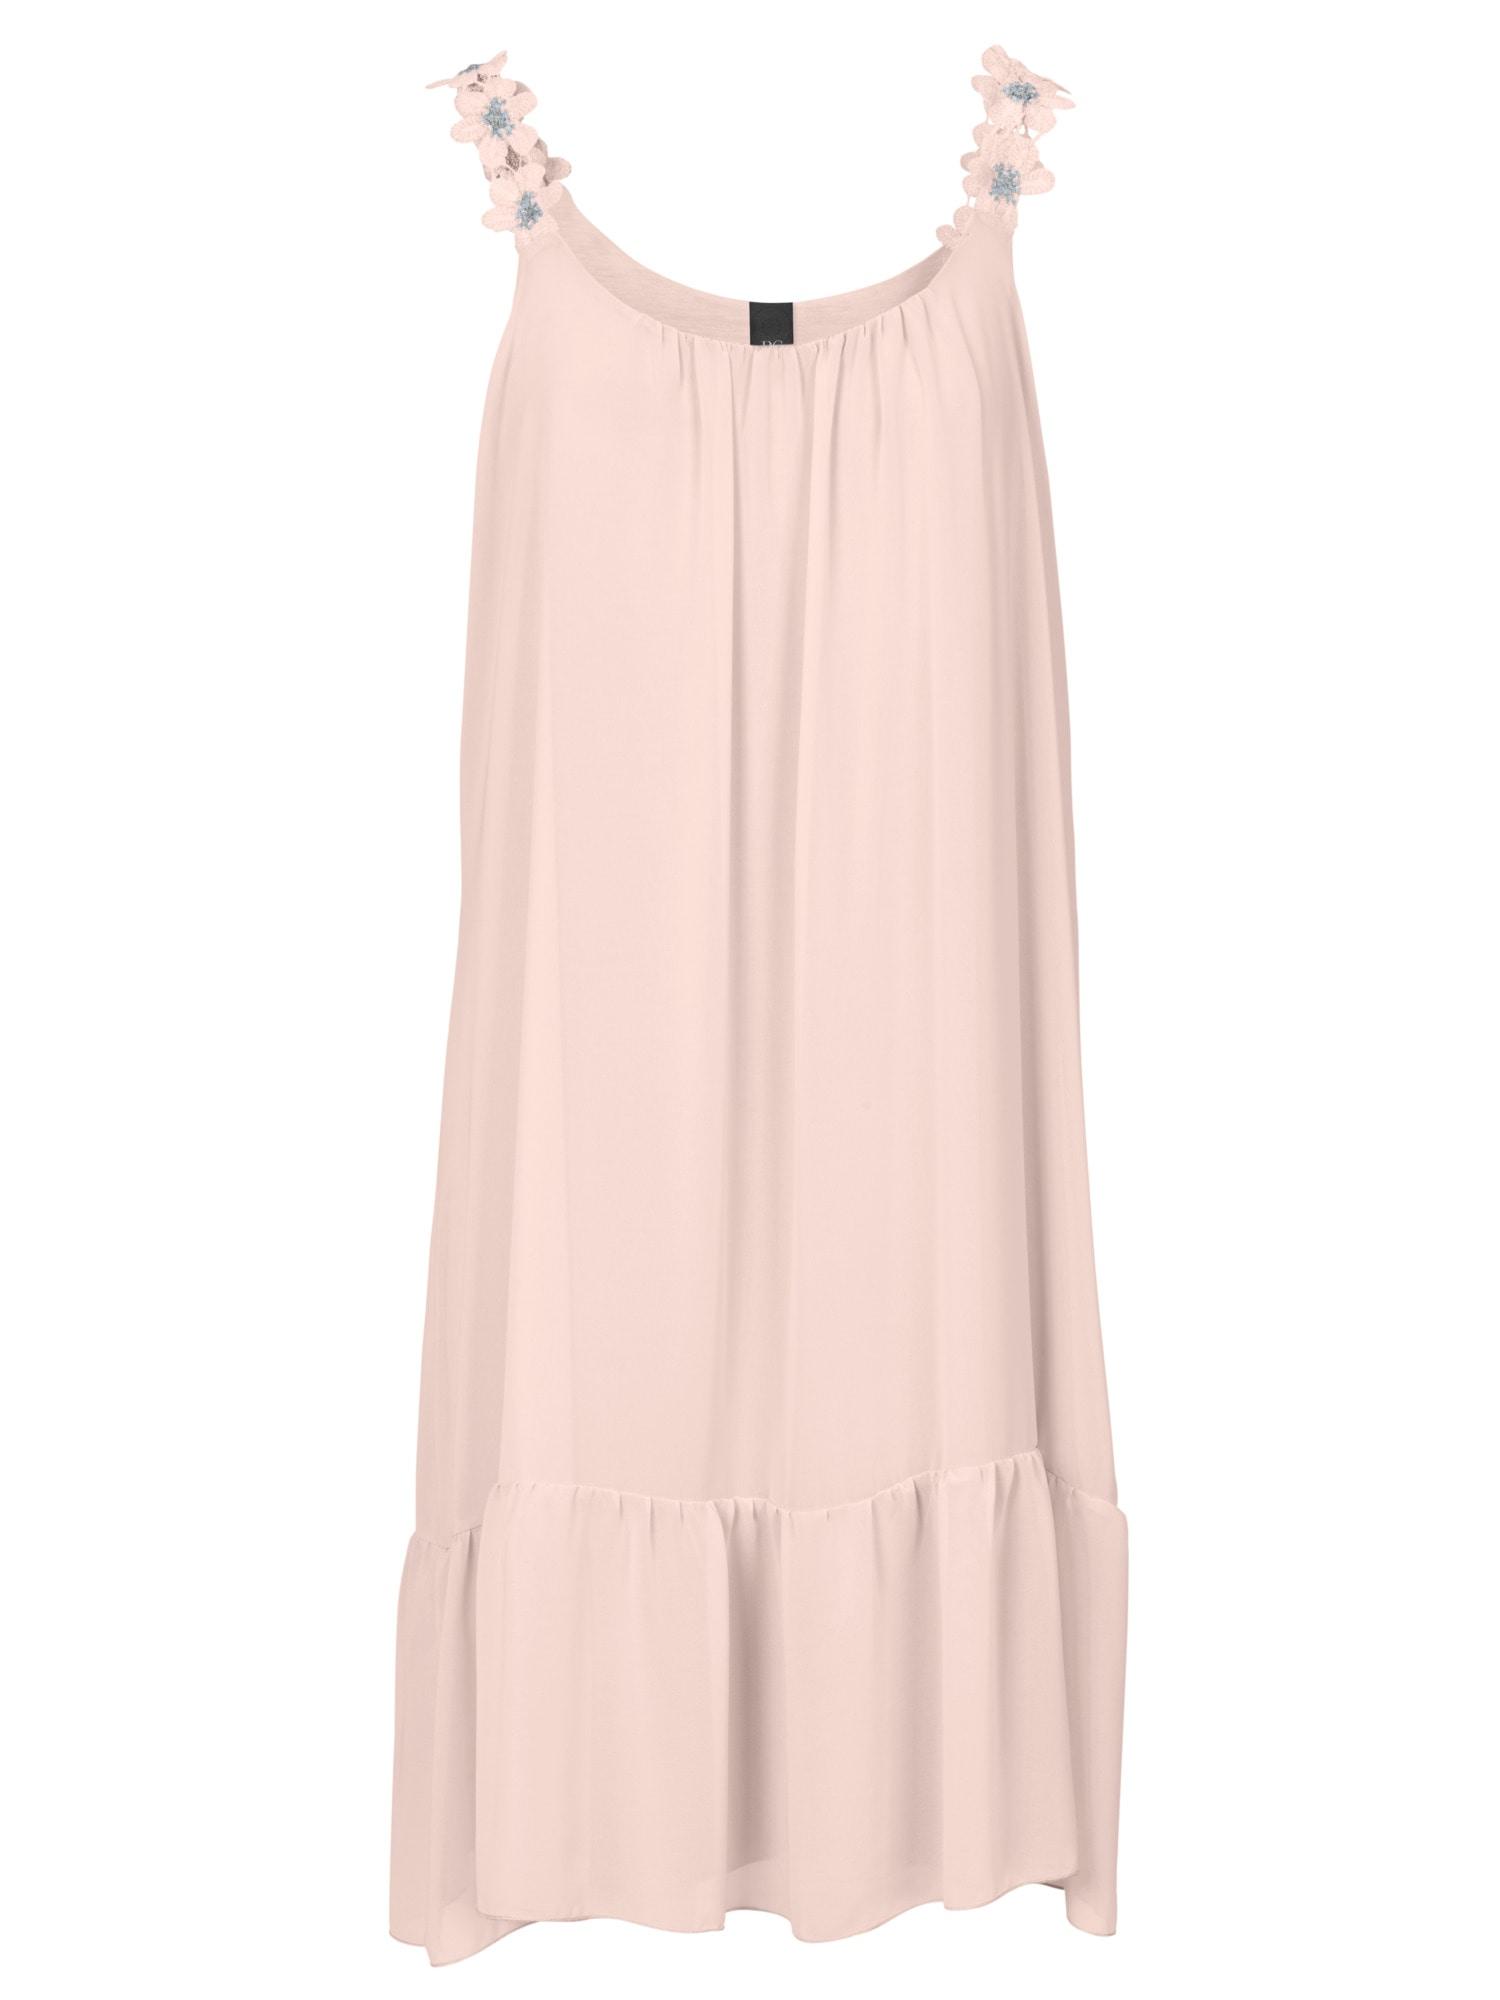 heine CASUAL Kleid ärmellos